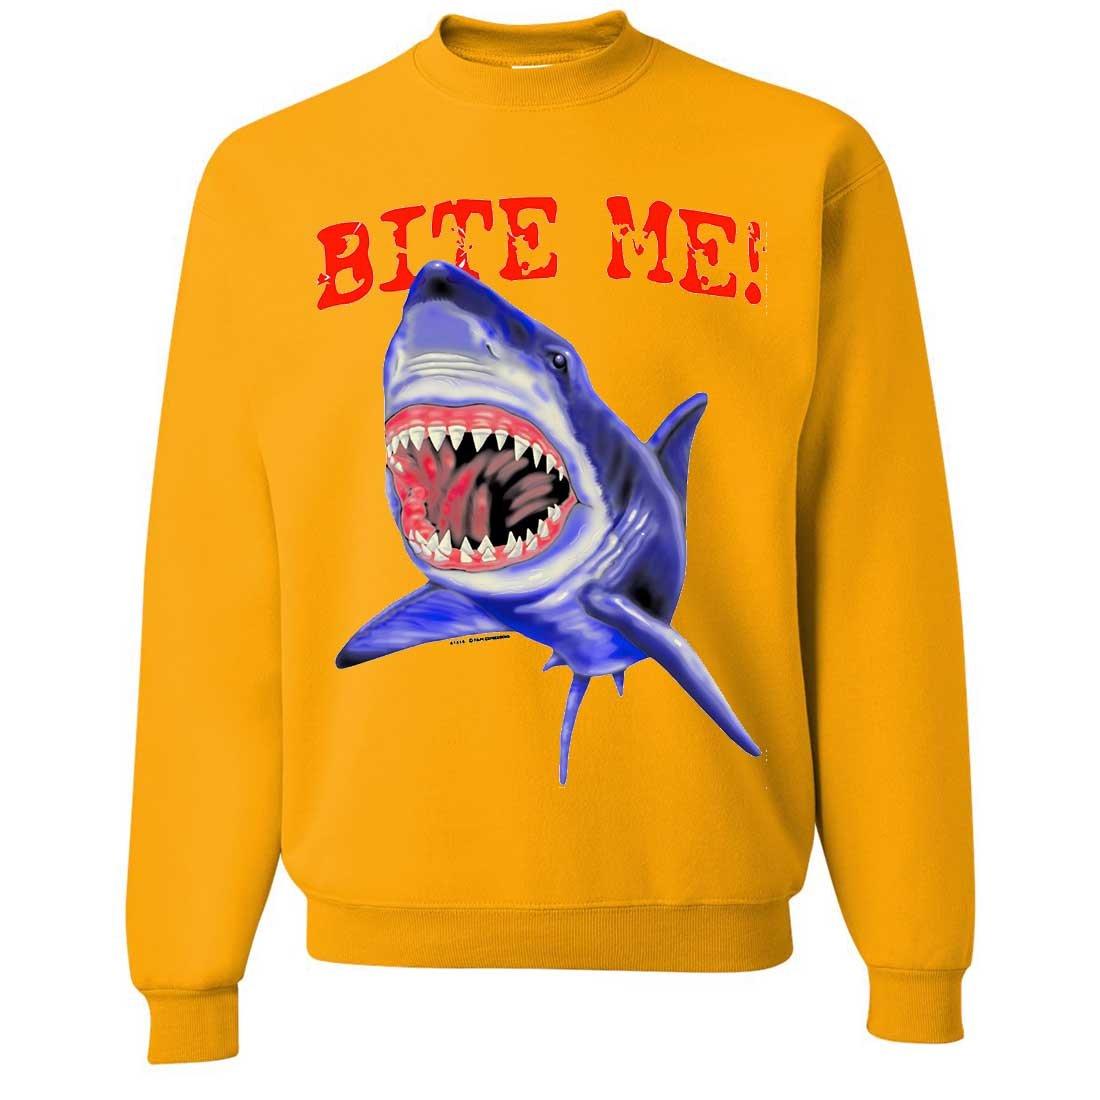 Bite Me Great White Shark Crewneck Sweatshirt